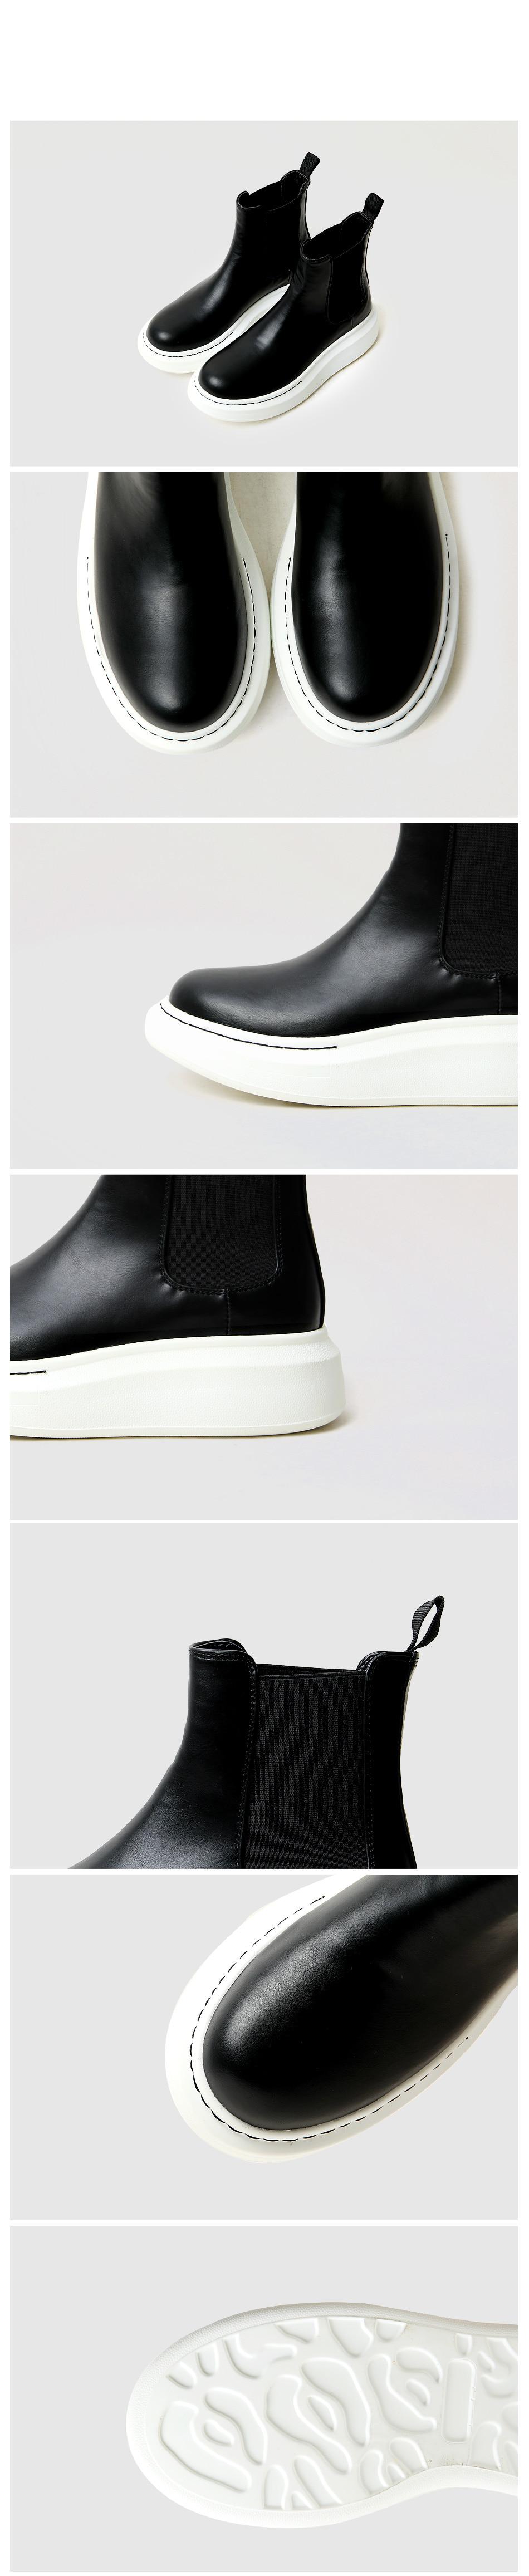 Tovik Full Heel Chelsea Boots 5cm